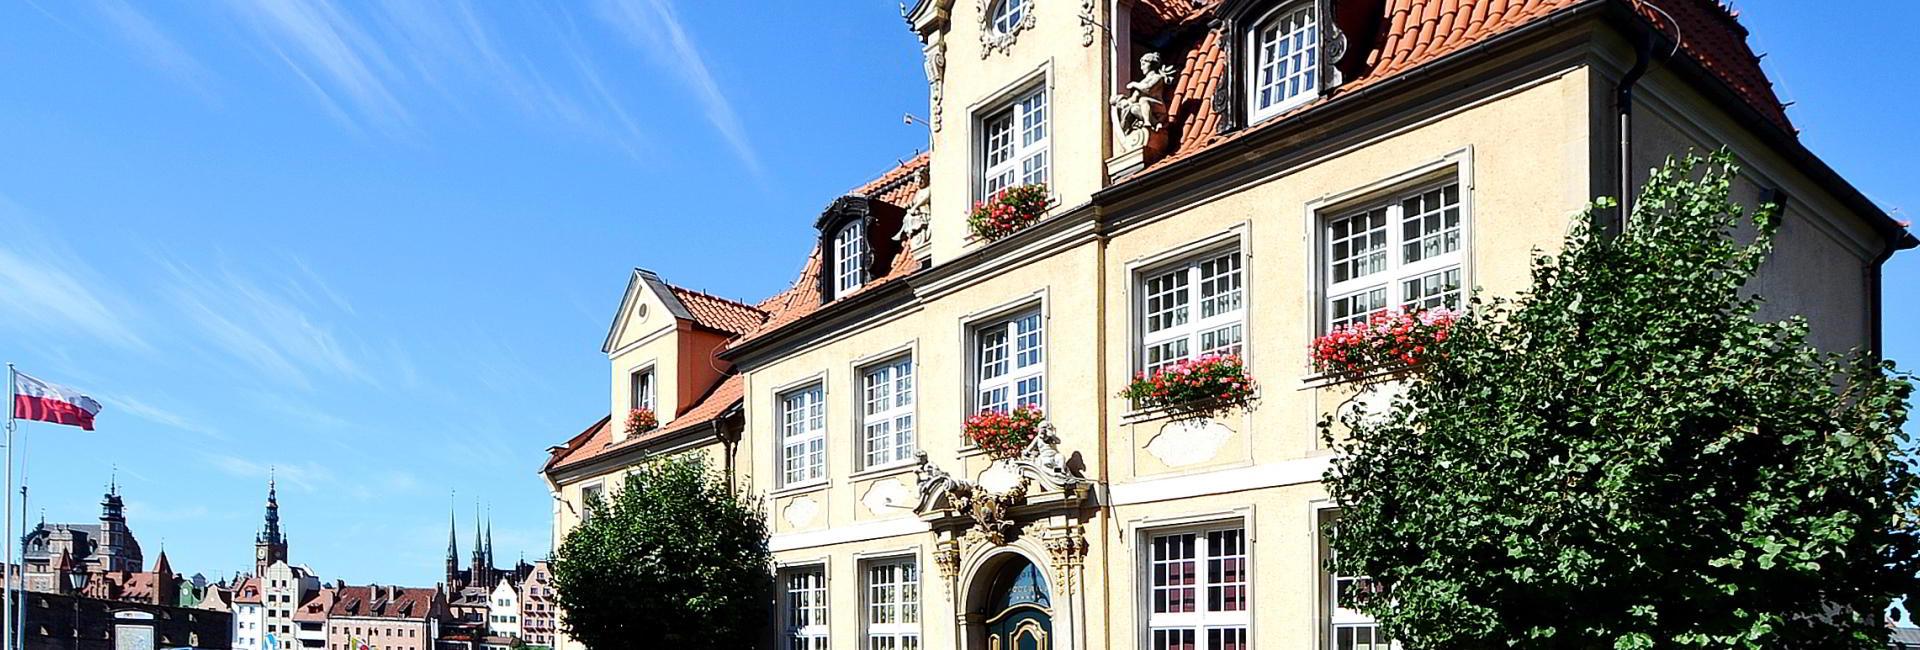 Hotel Podewils in Gdansk